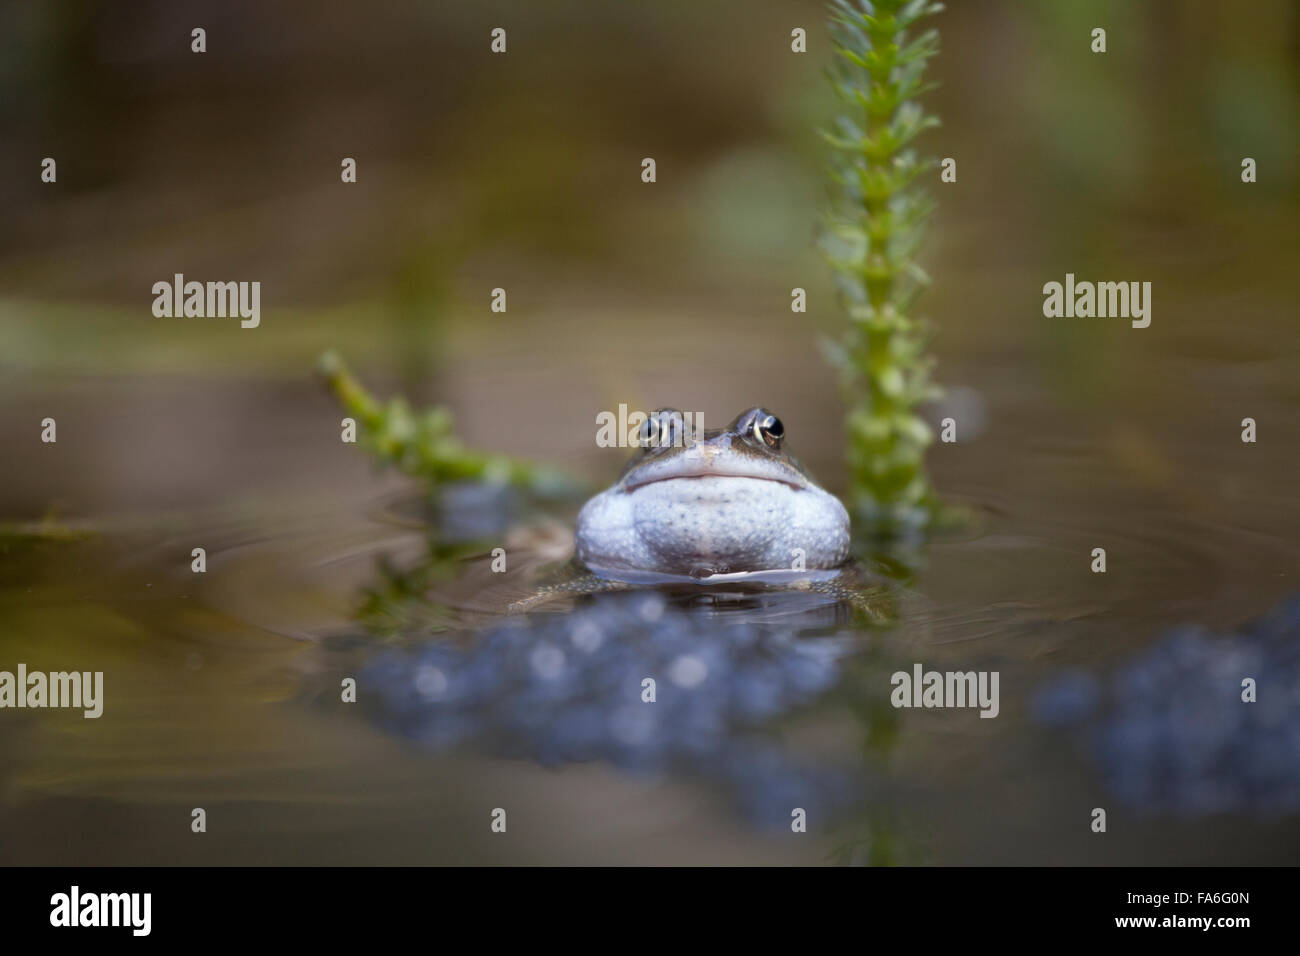 Common frog (Rana temporaria) croaking in a garden pond - Stock Image